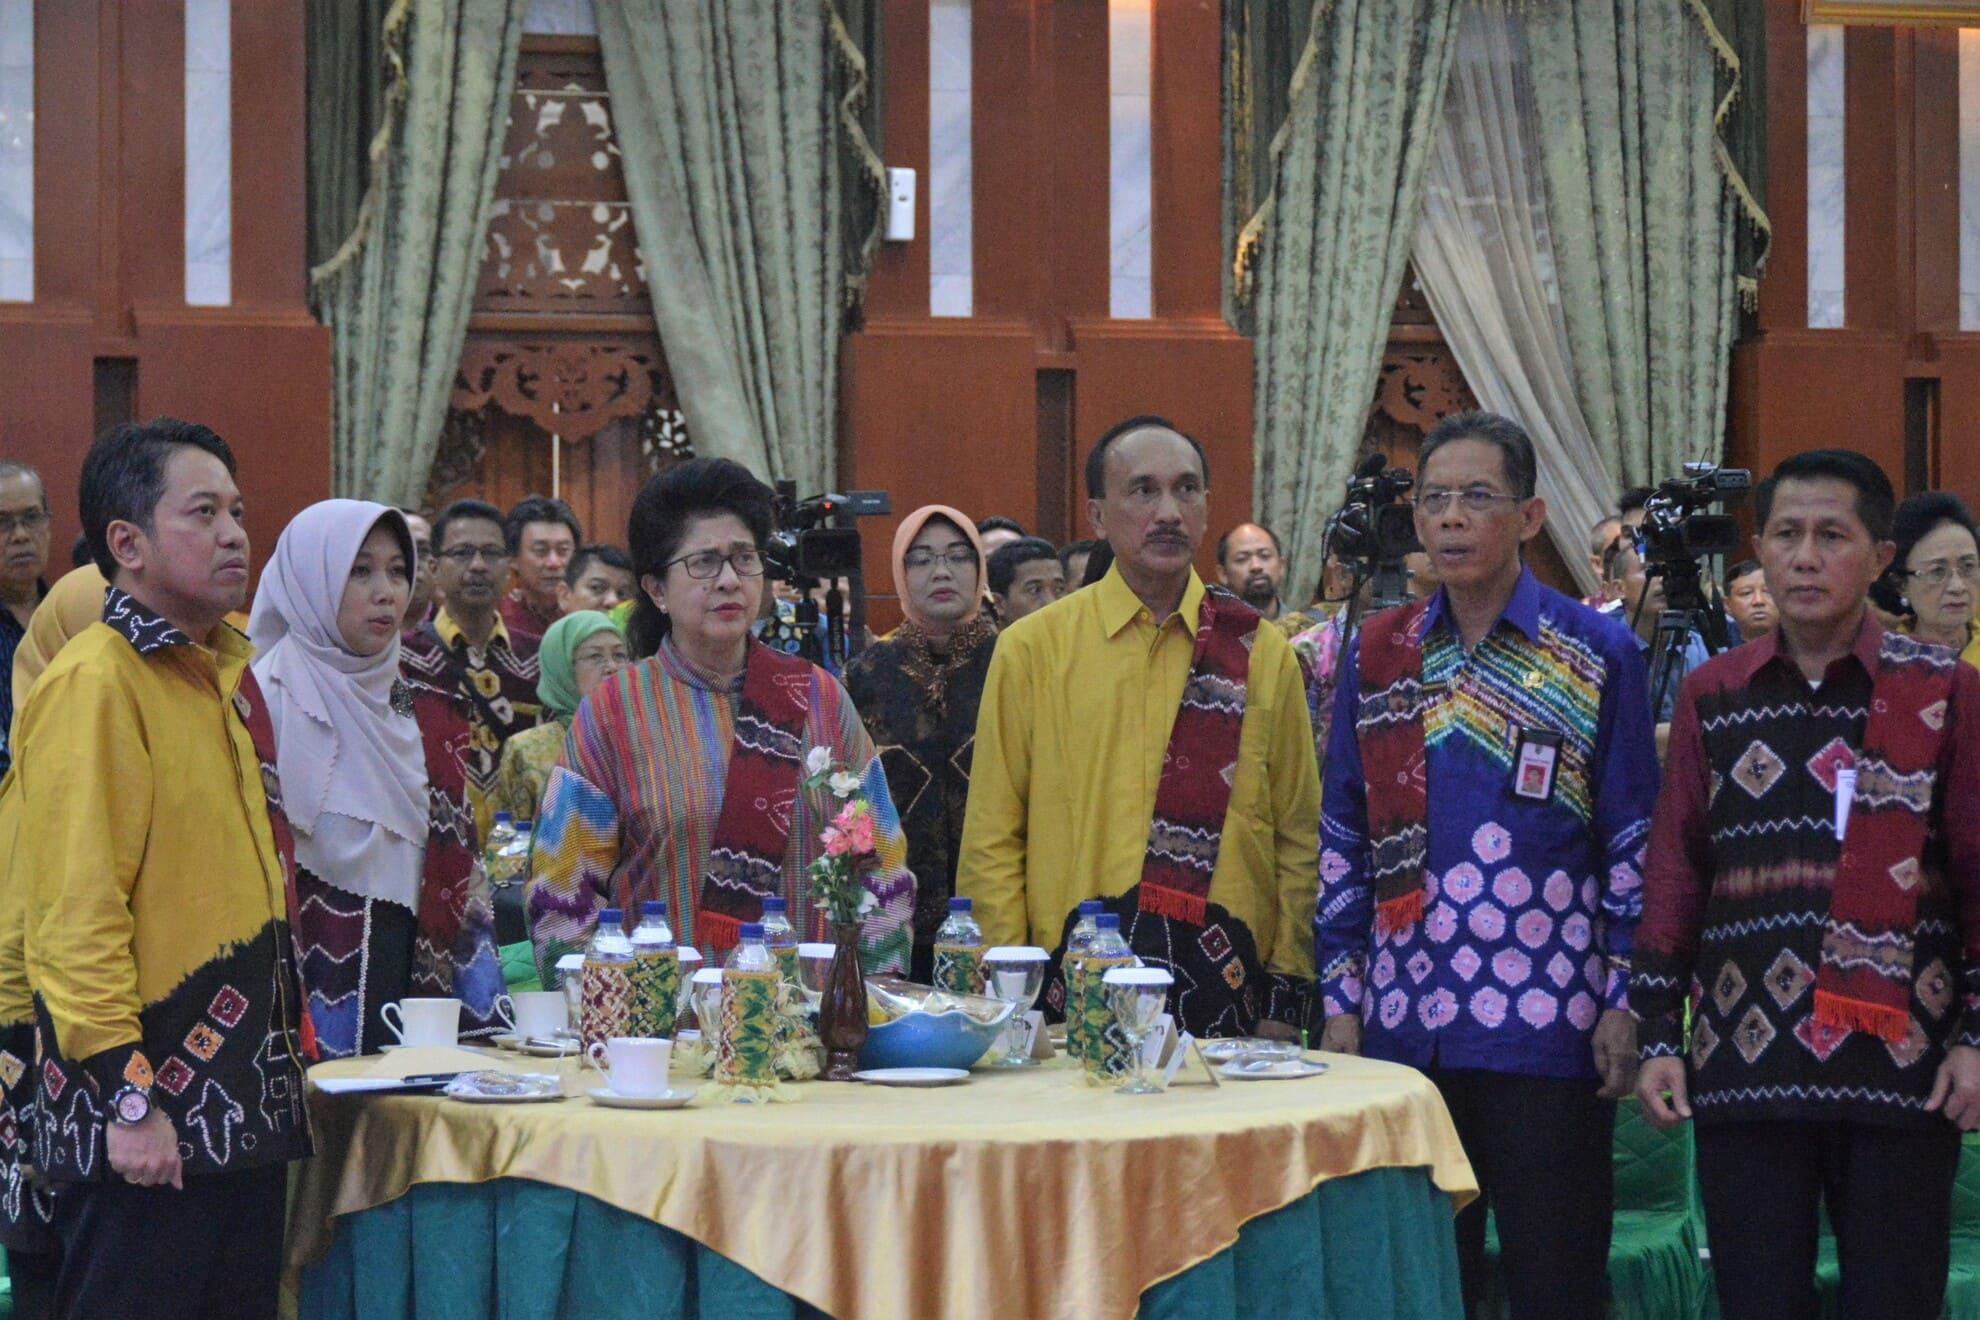 09-03-2017-menkes-mendengarkan-lagu-indonesia-raya-di-acara-rapat-kerja-koalisi-kependudukan-yang-berlangsung-di-banjarmasin